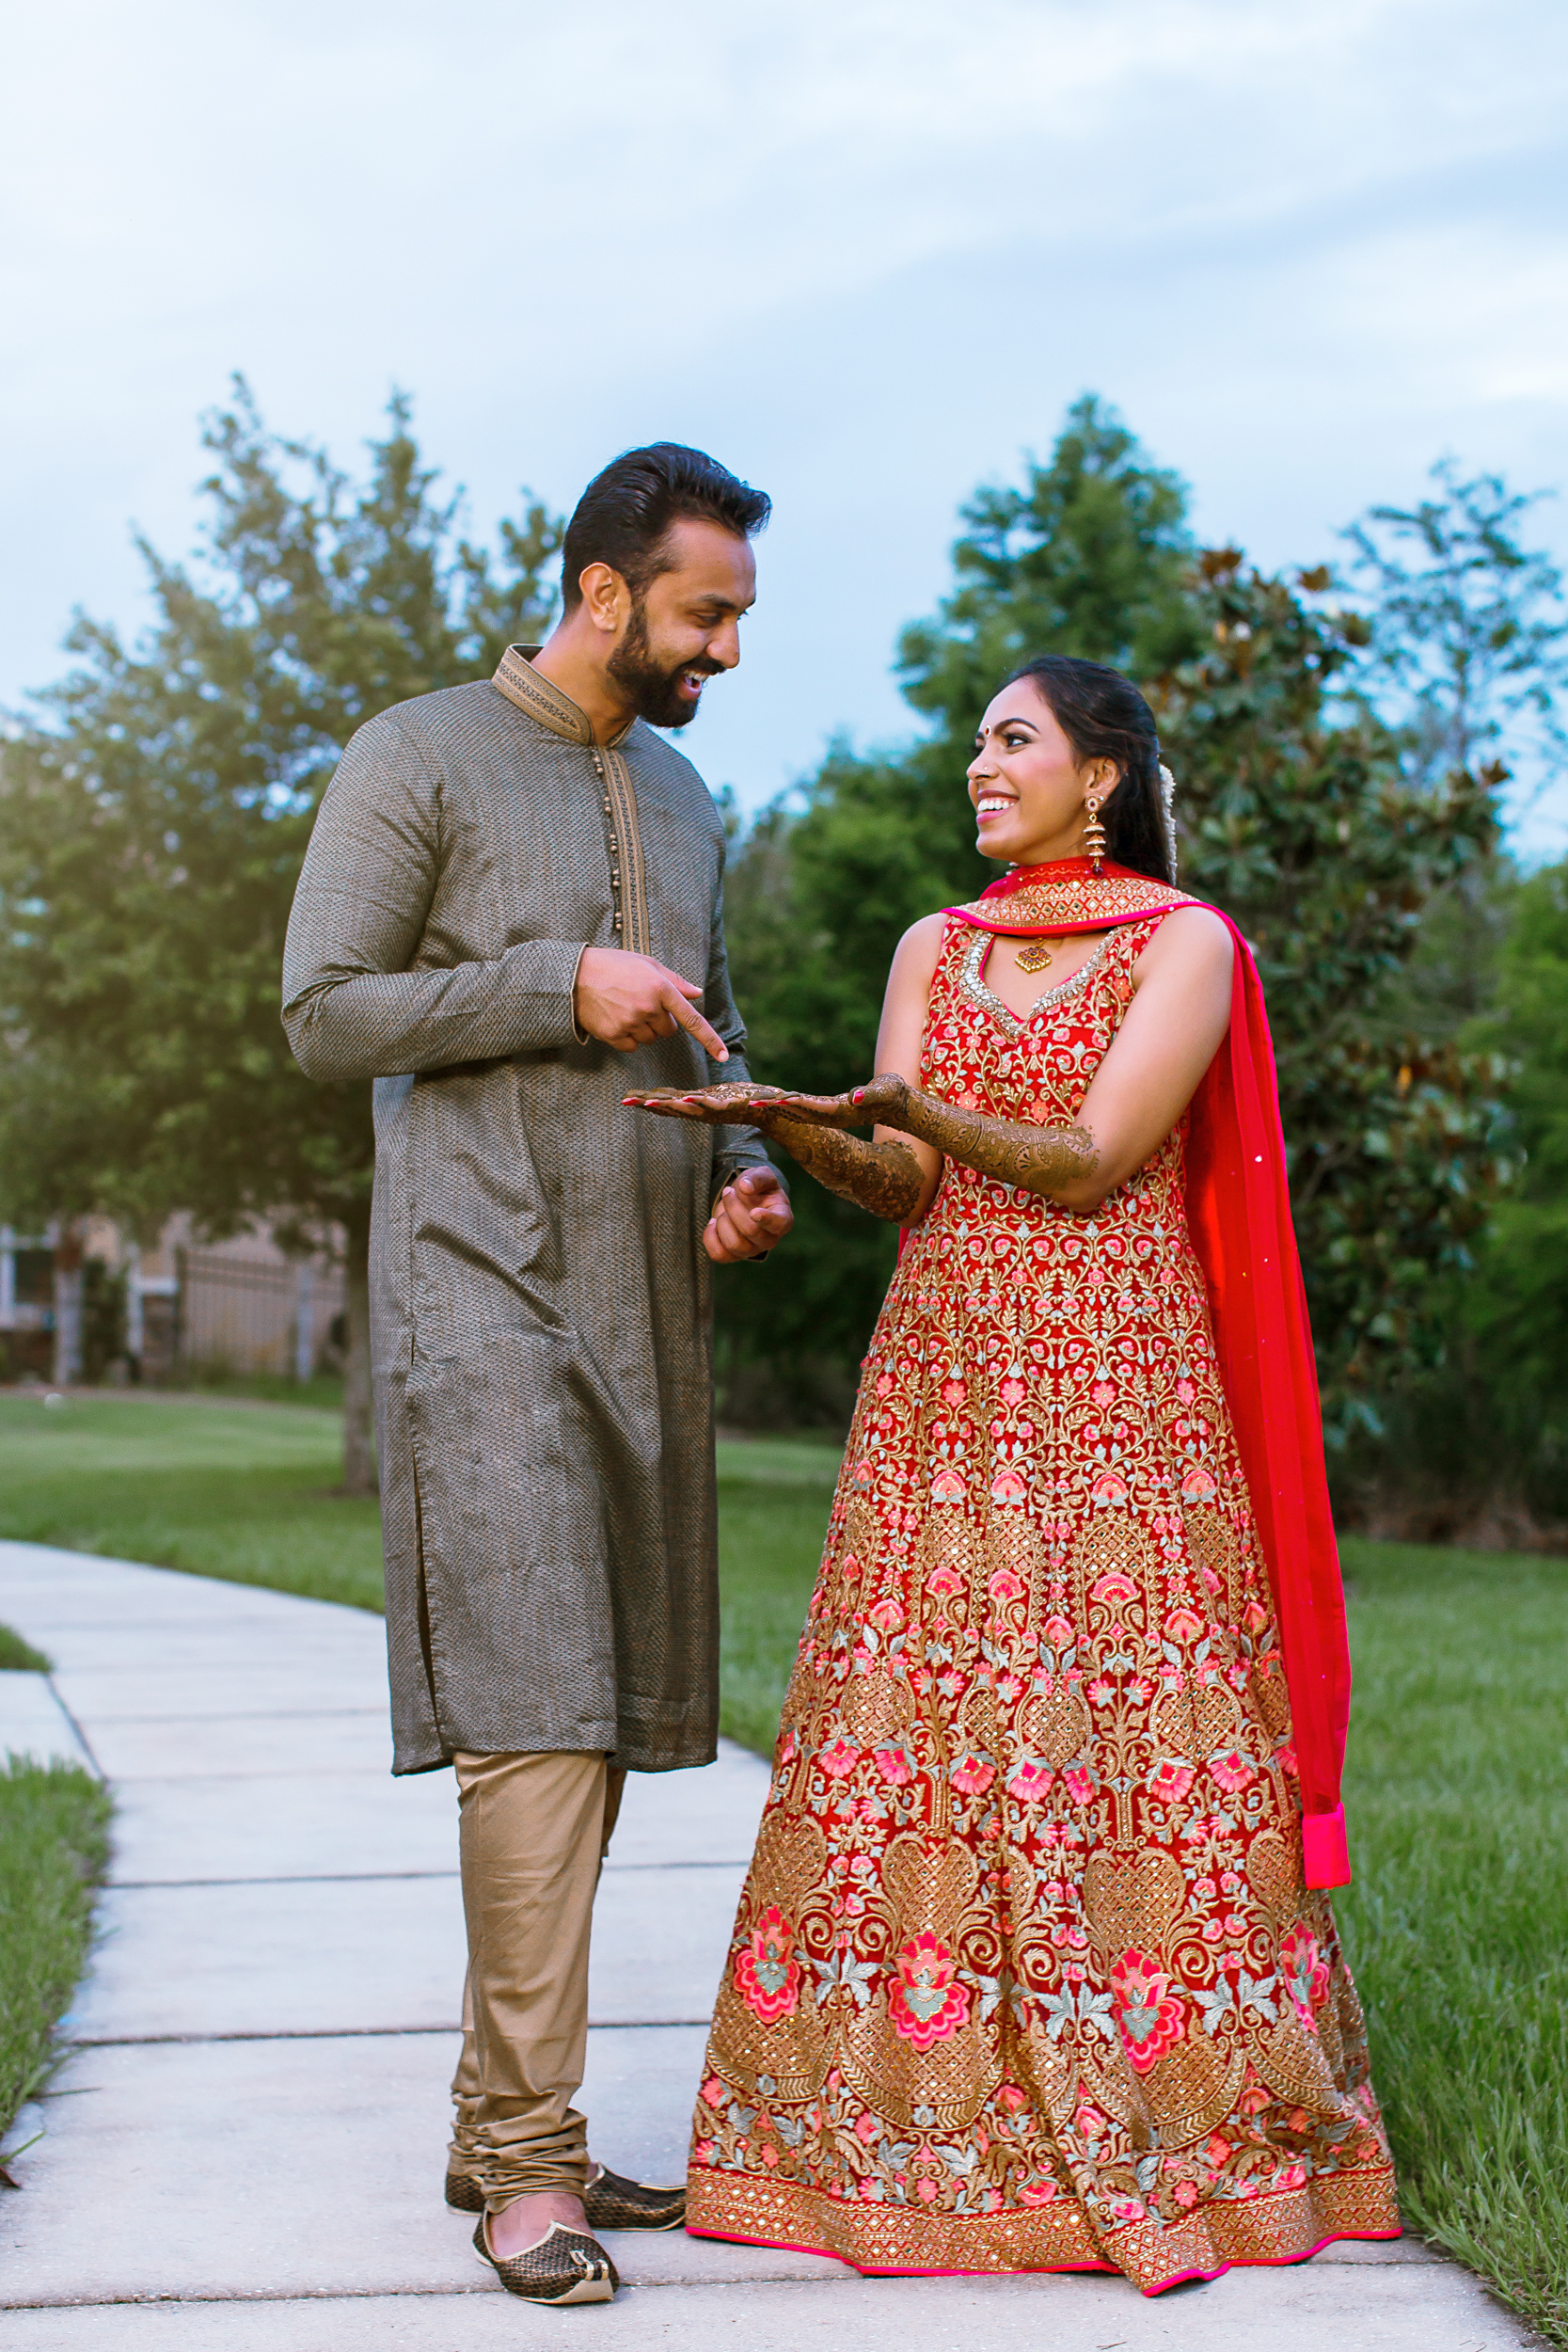 Orlando Indian wedding photography